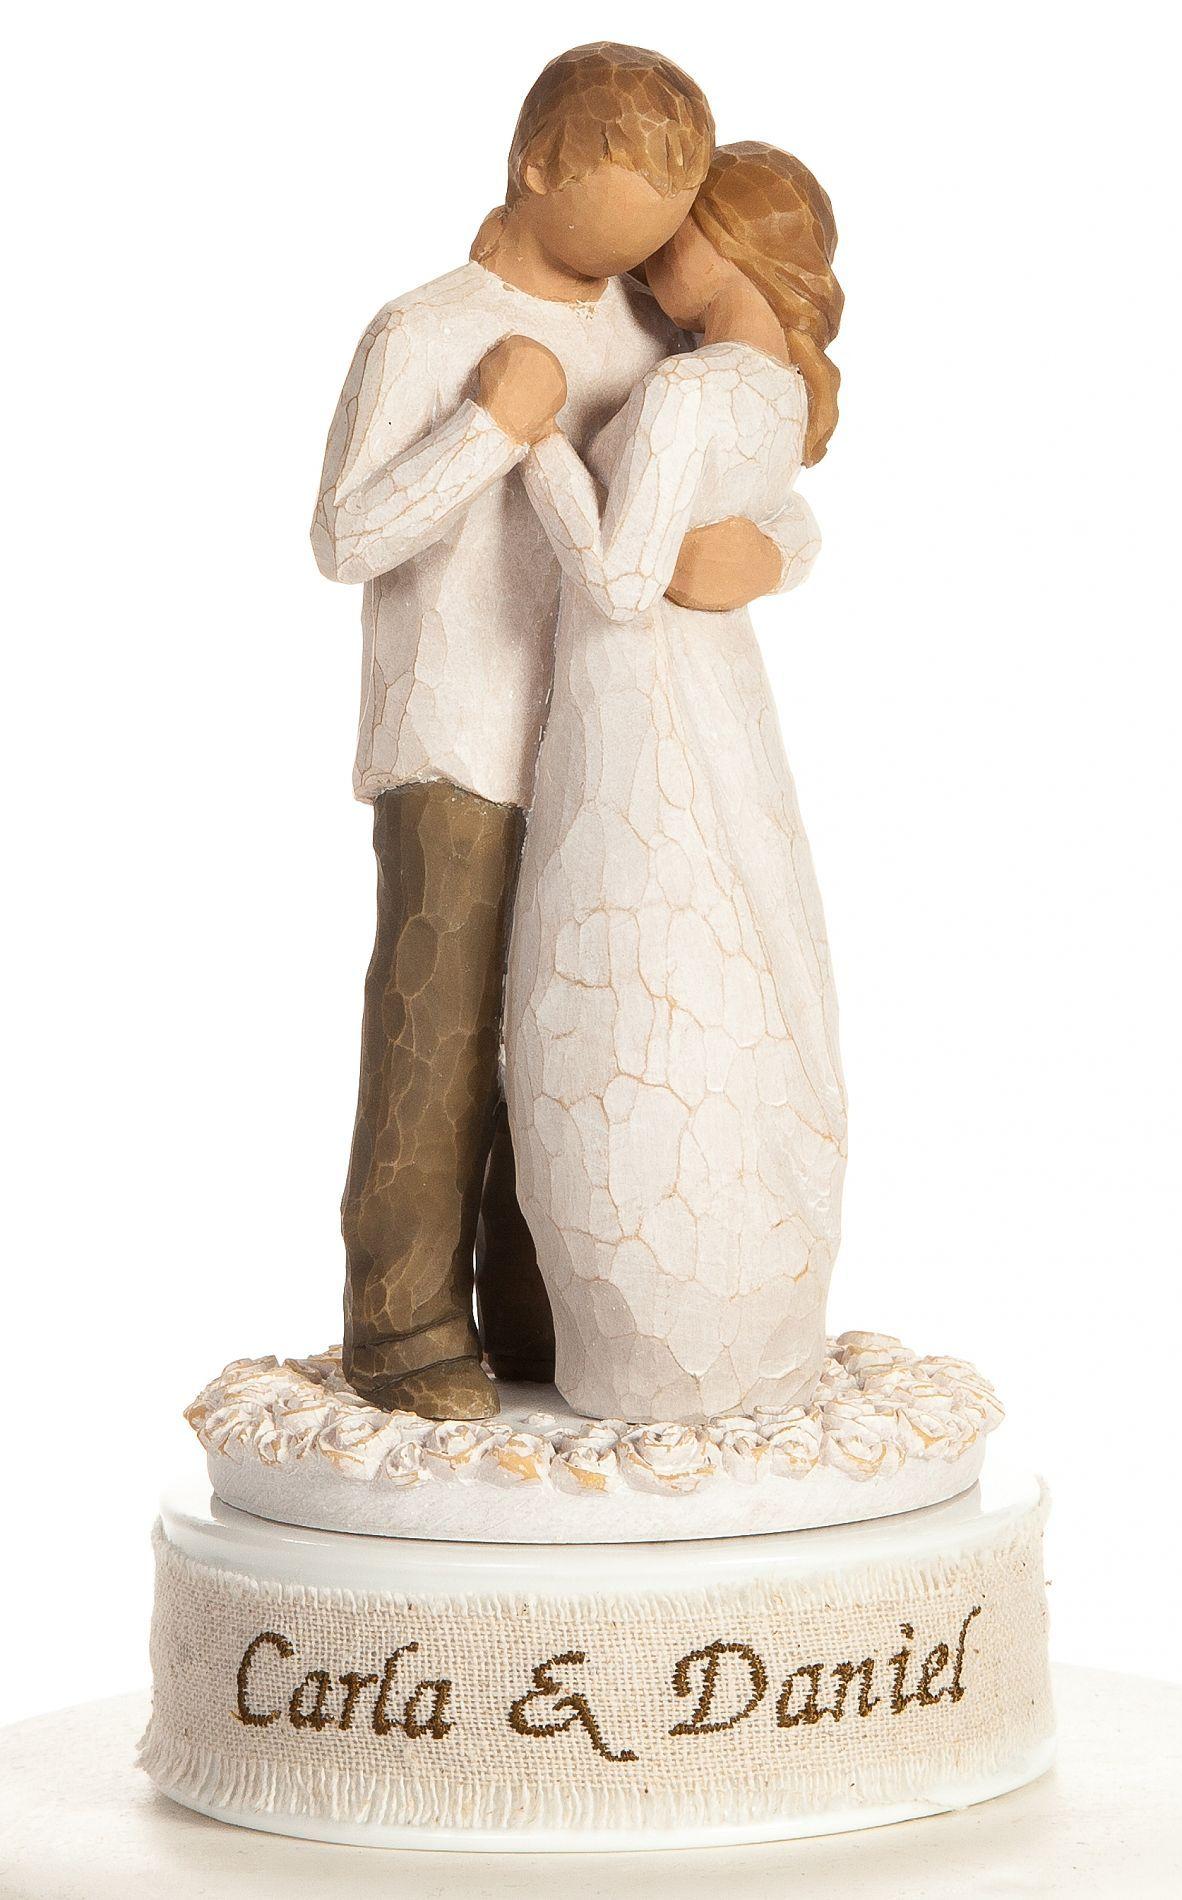 Bomboniere Matrimonio Willow Tree.Personalized Embroidery Willow Tree Promise Wedding Cake